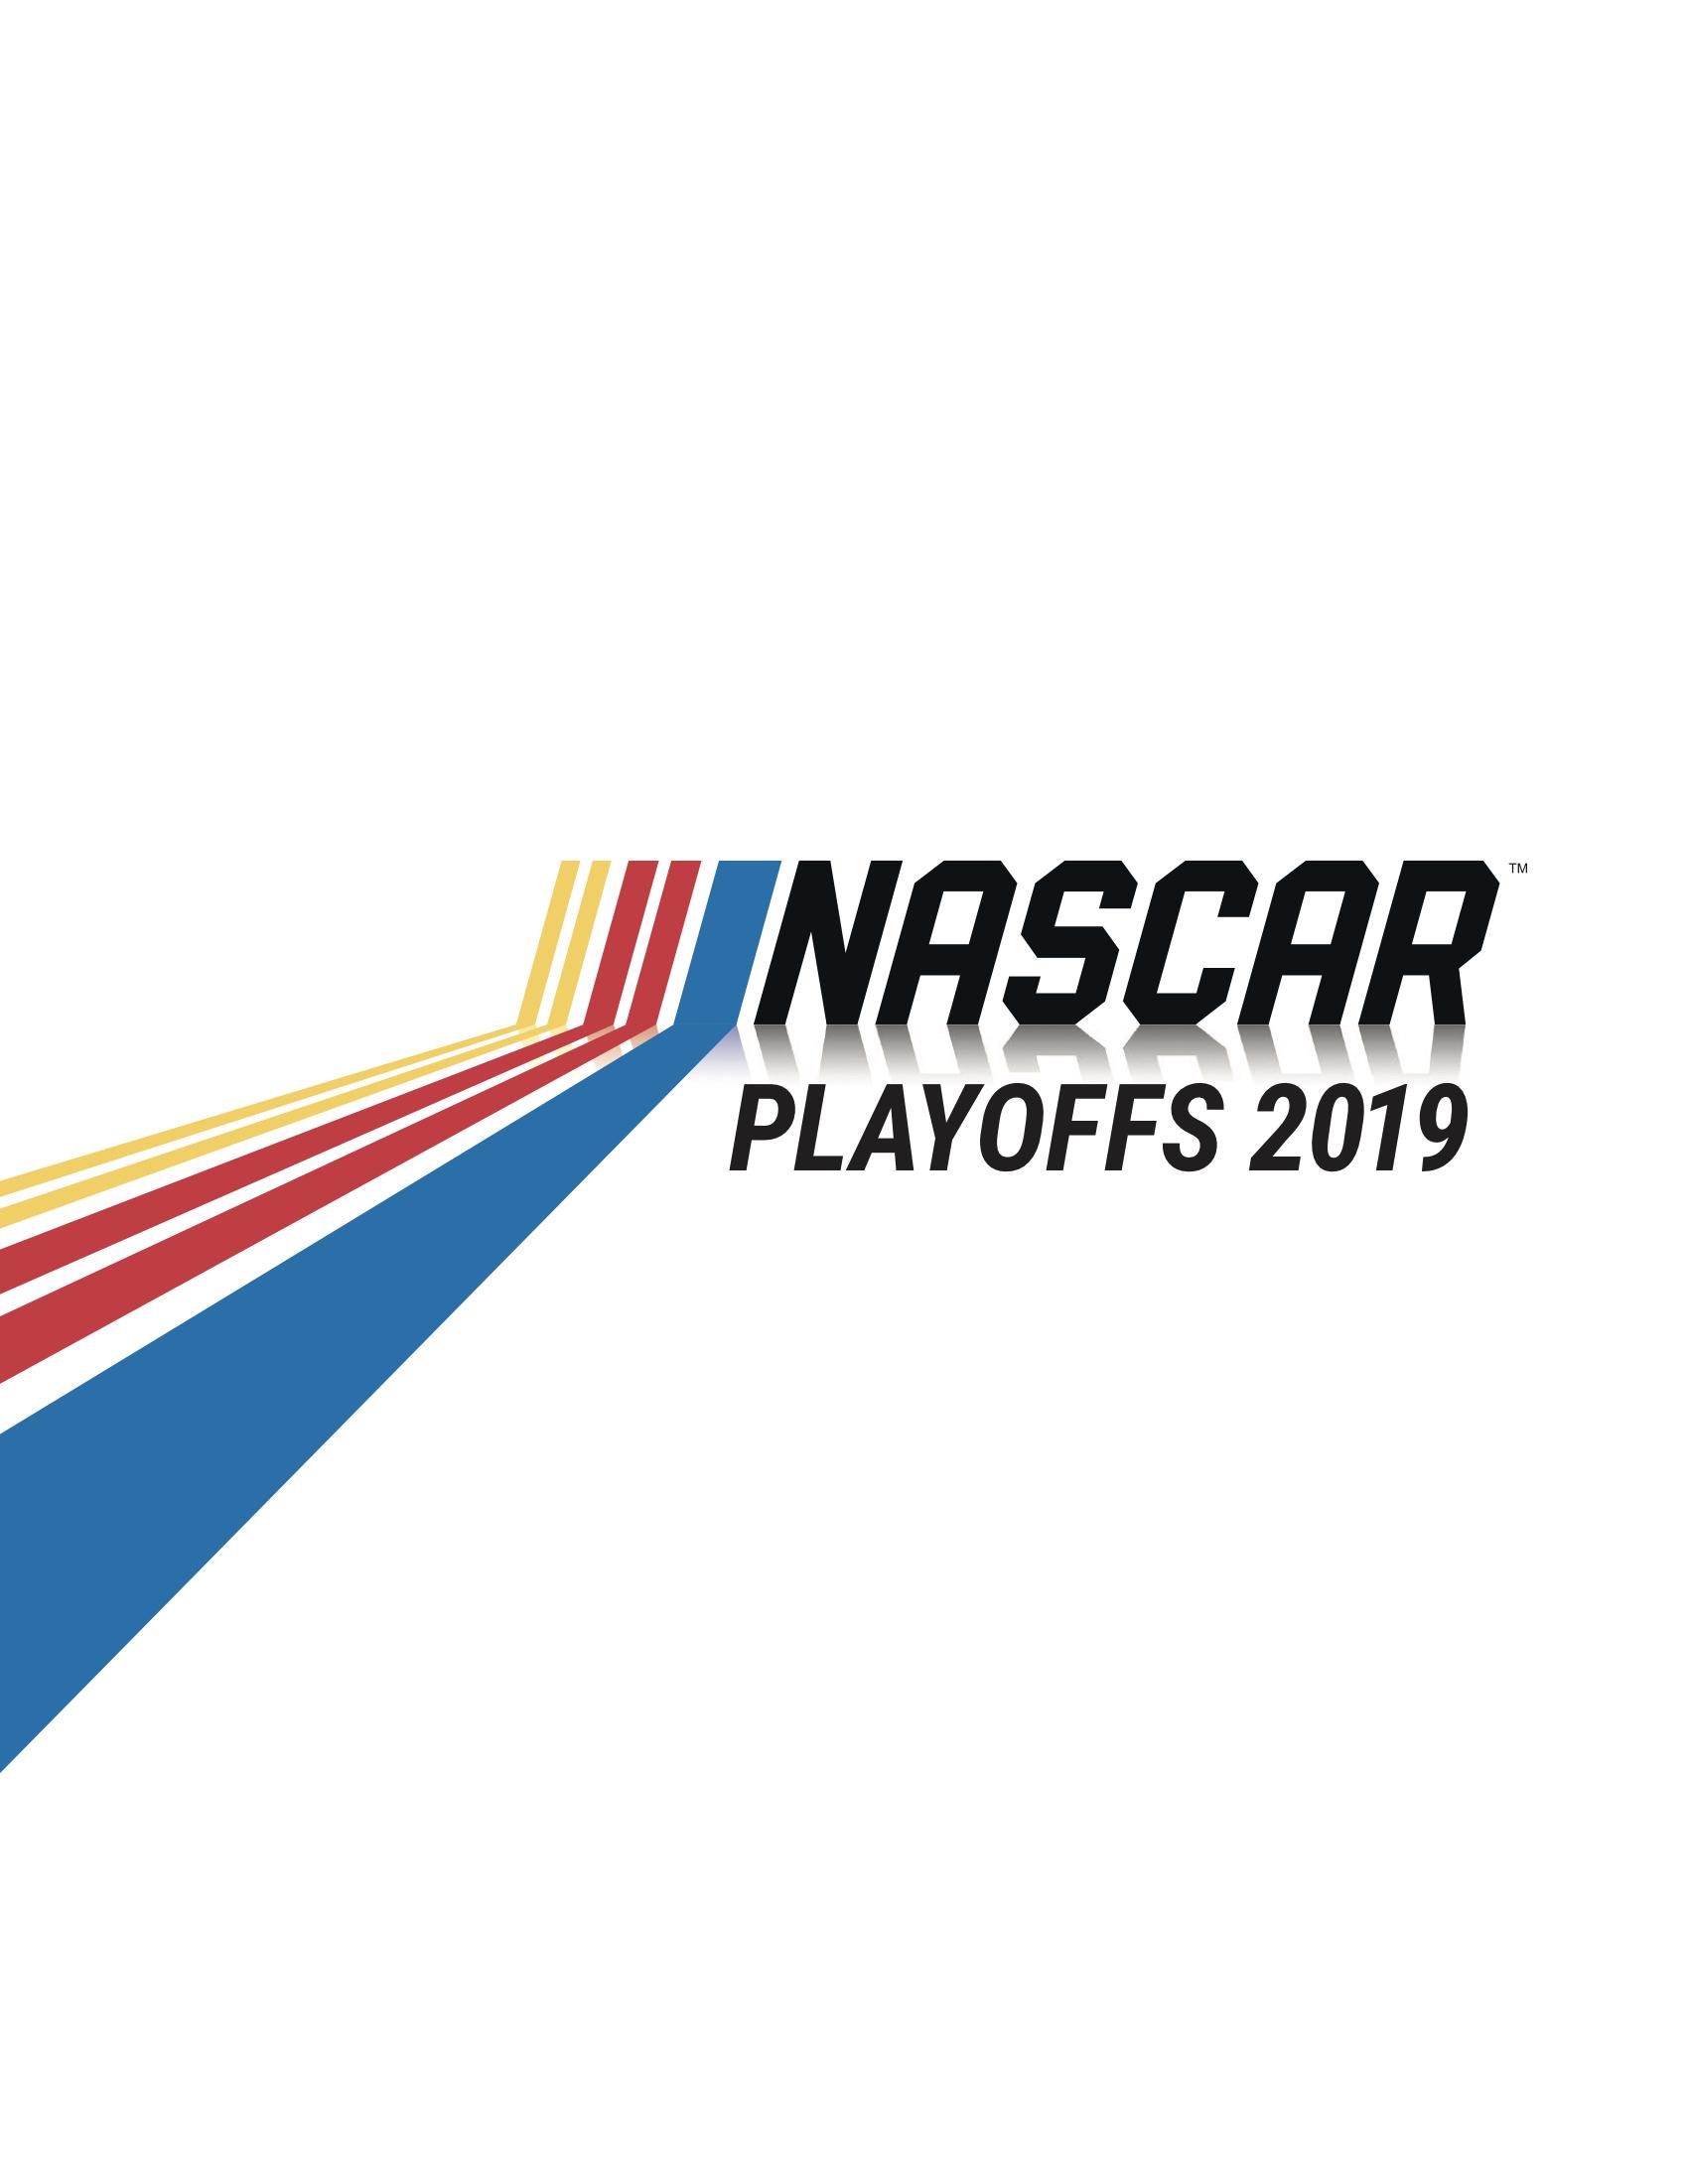 NASCARCampaignsBook 1.jpg